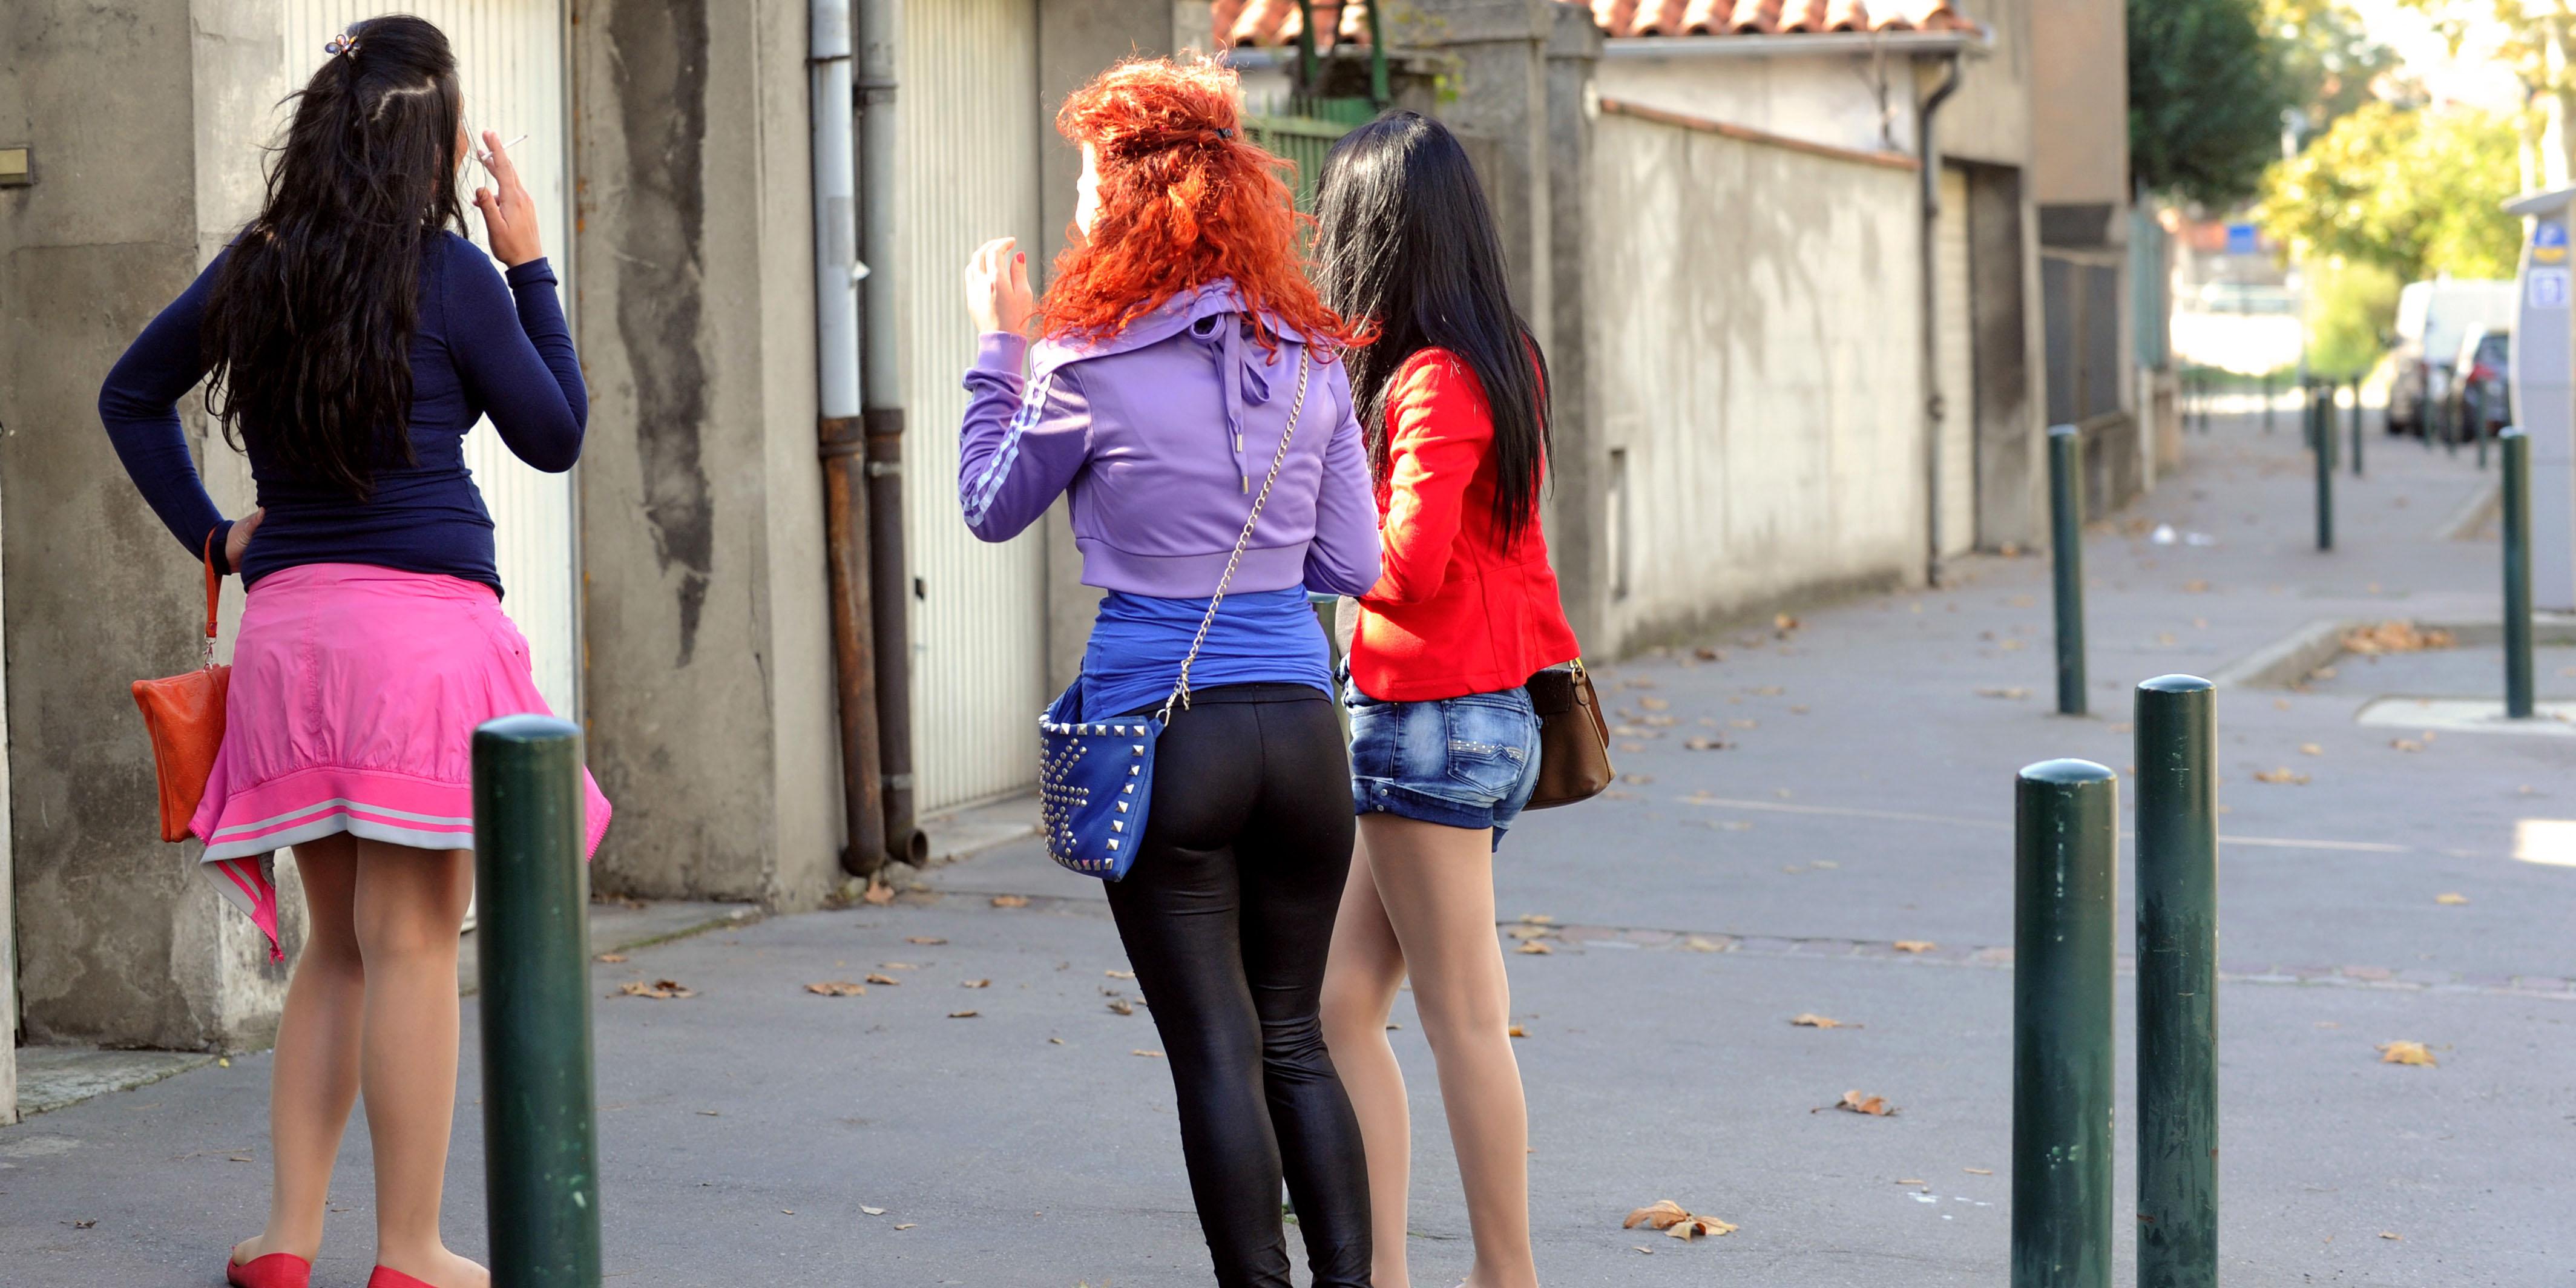 Проститутки трафик ретро индивидуалки спб